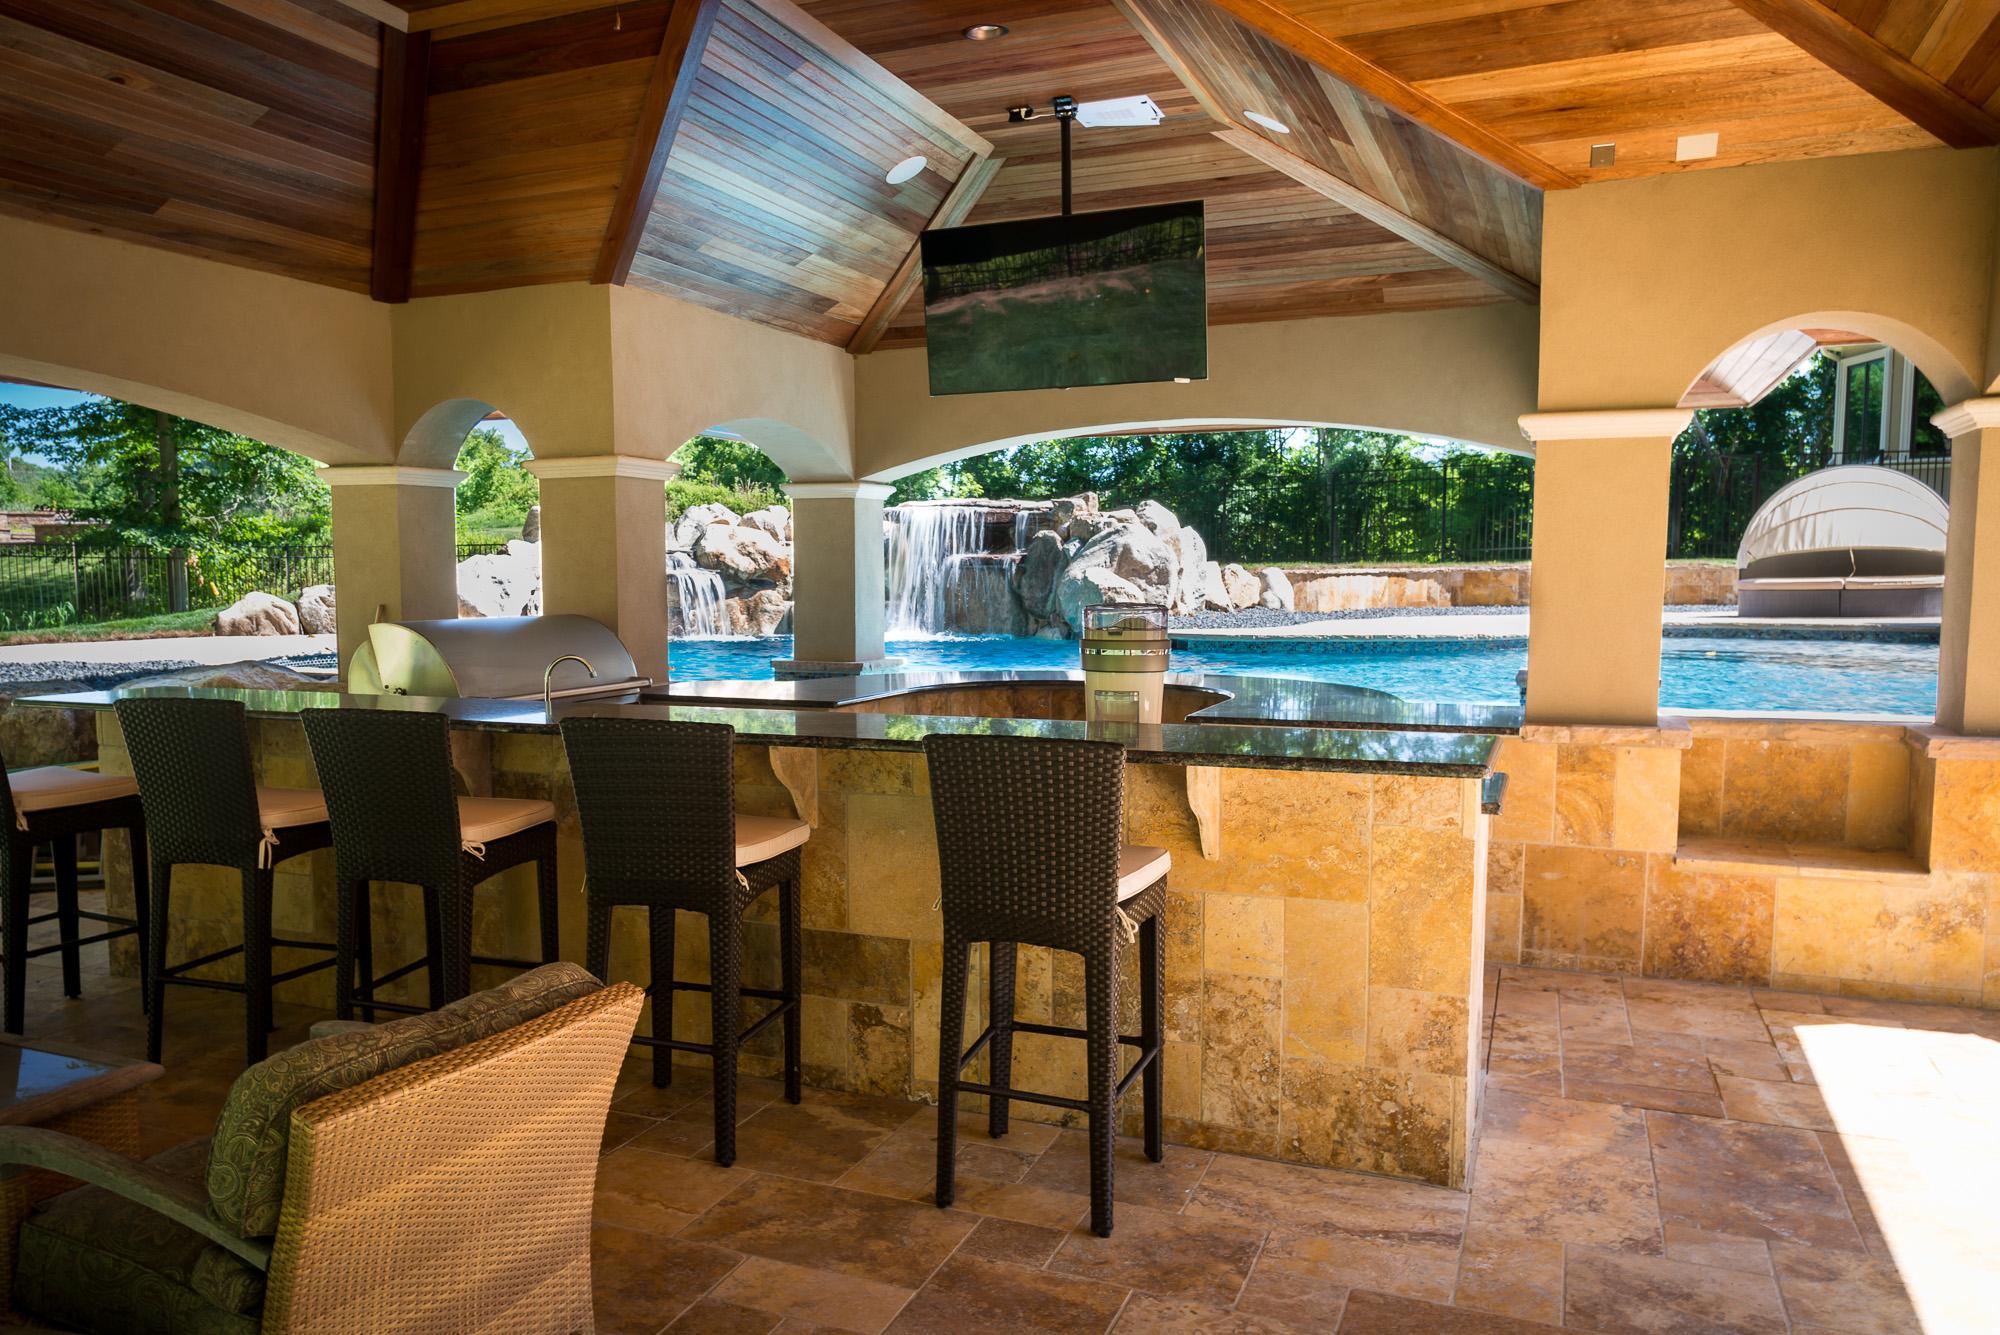 Holmdel NJ - Custom Inground Swimming Pool Design & Construction